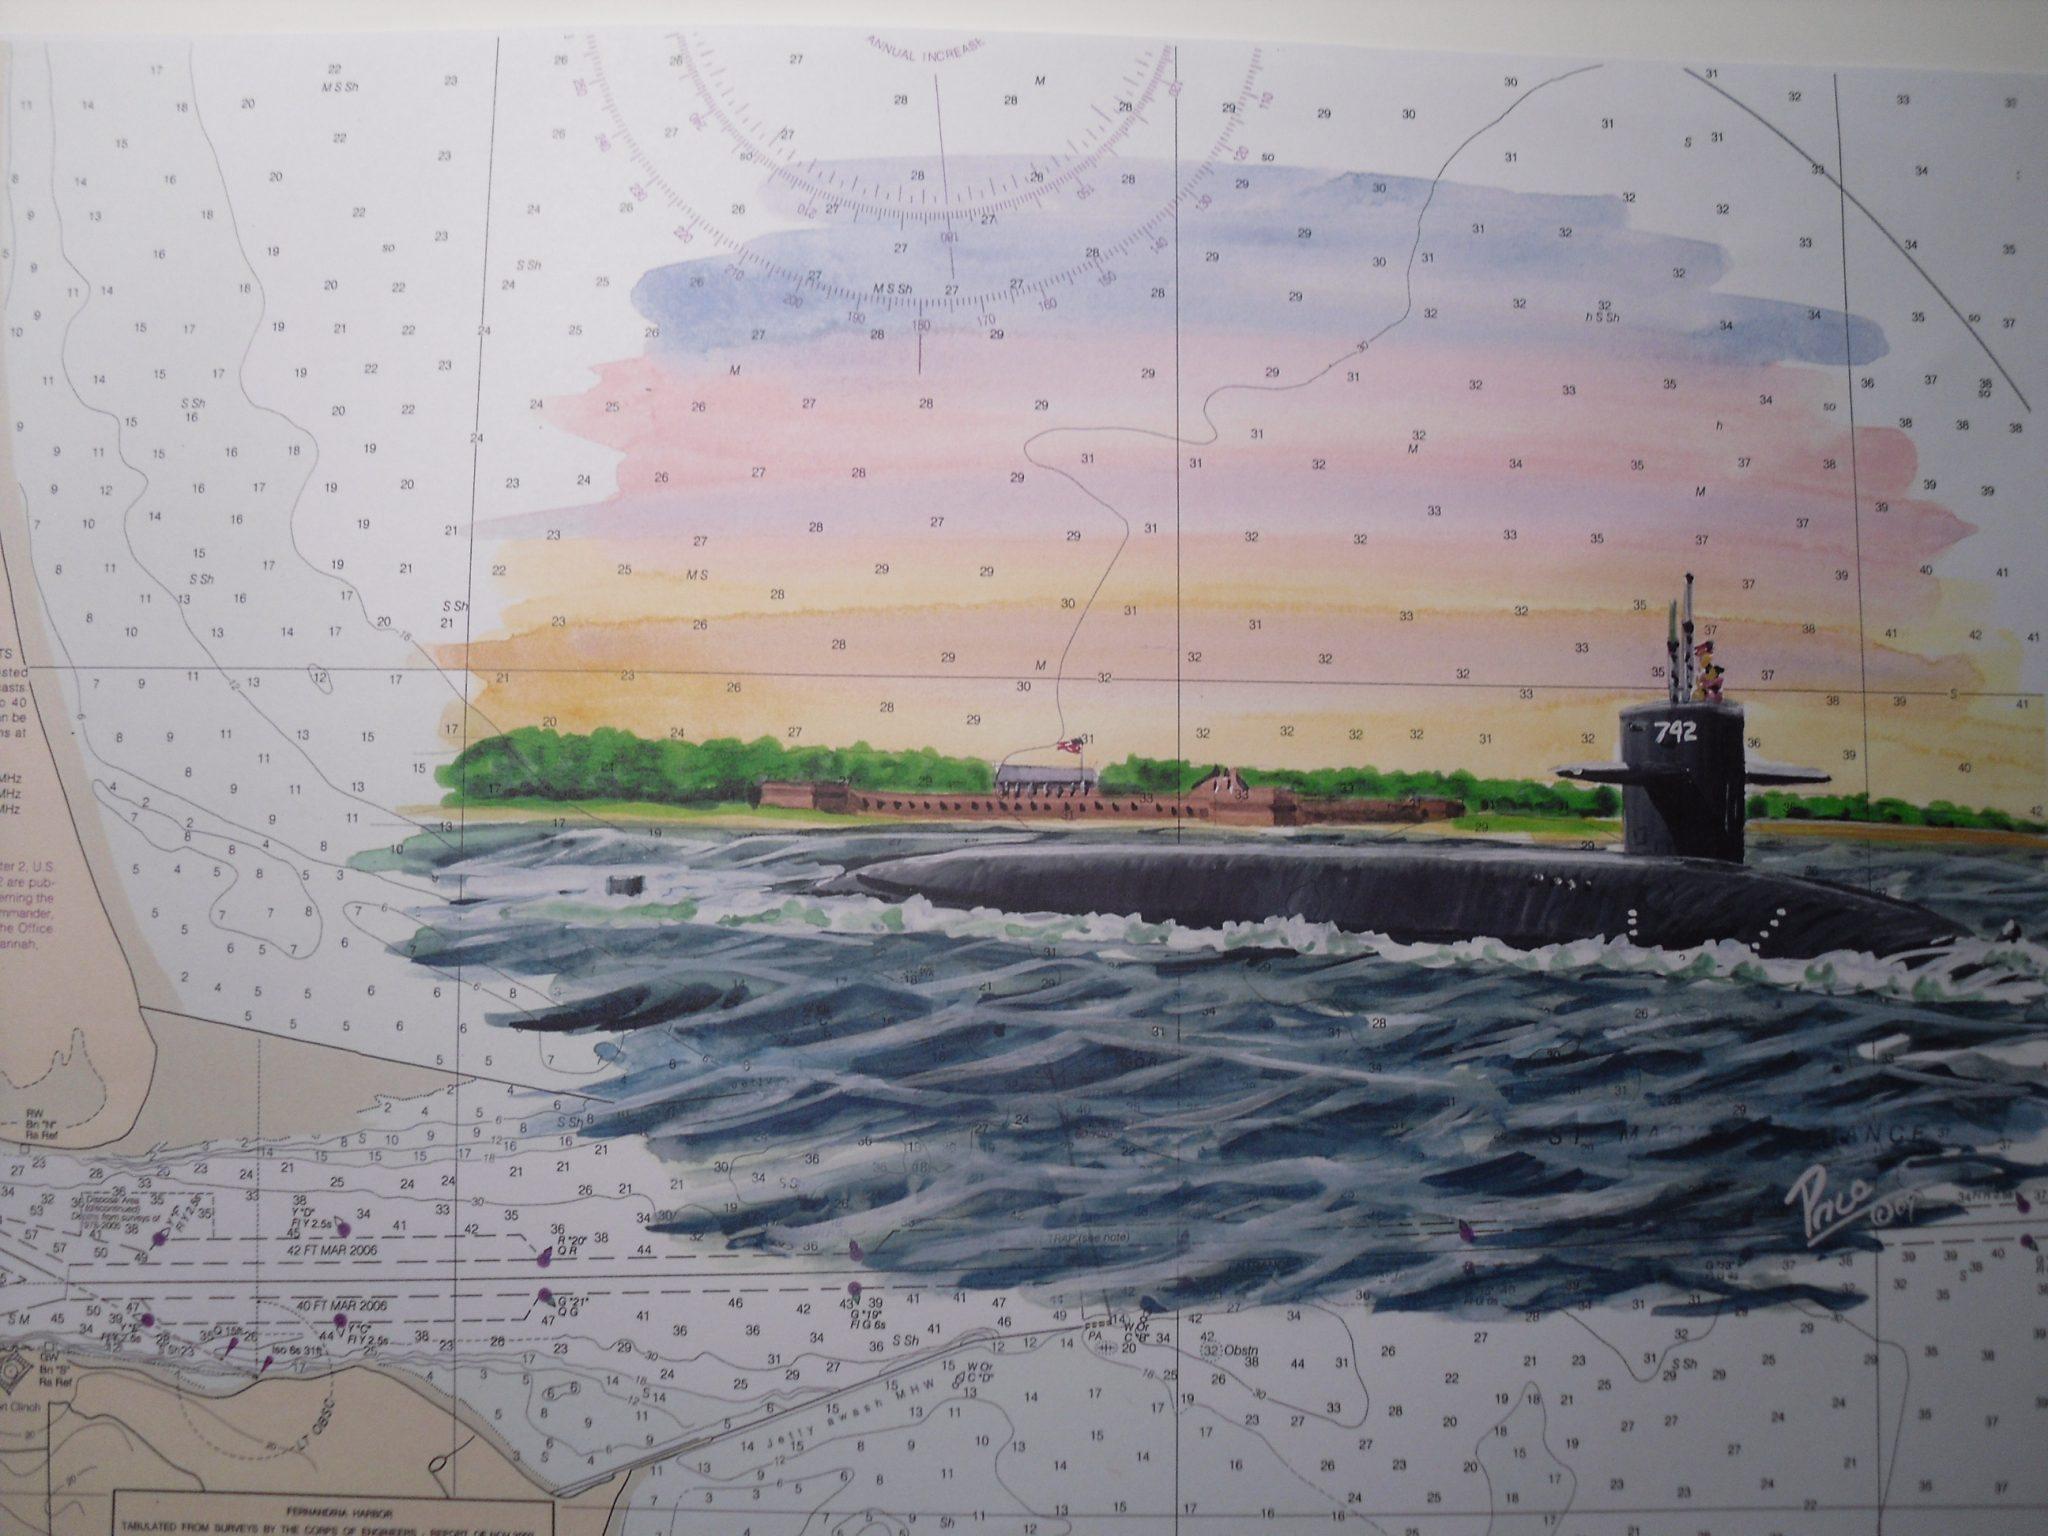 USS Wyoming SSBN 742 Kings Bay Georgia - Submarine Art by Daniel Price